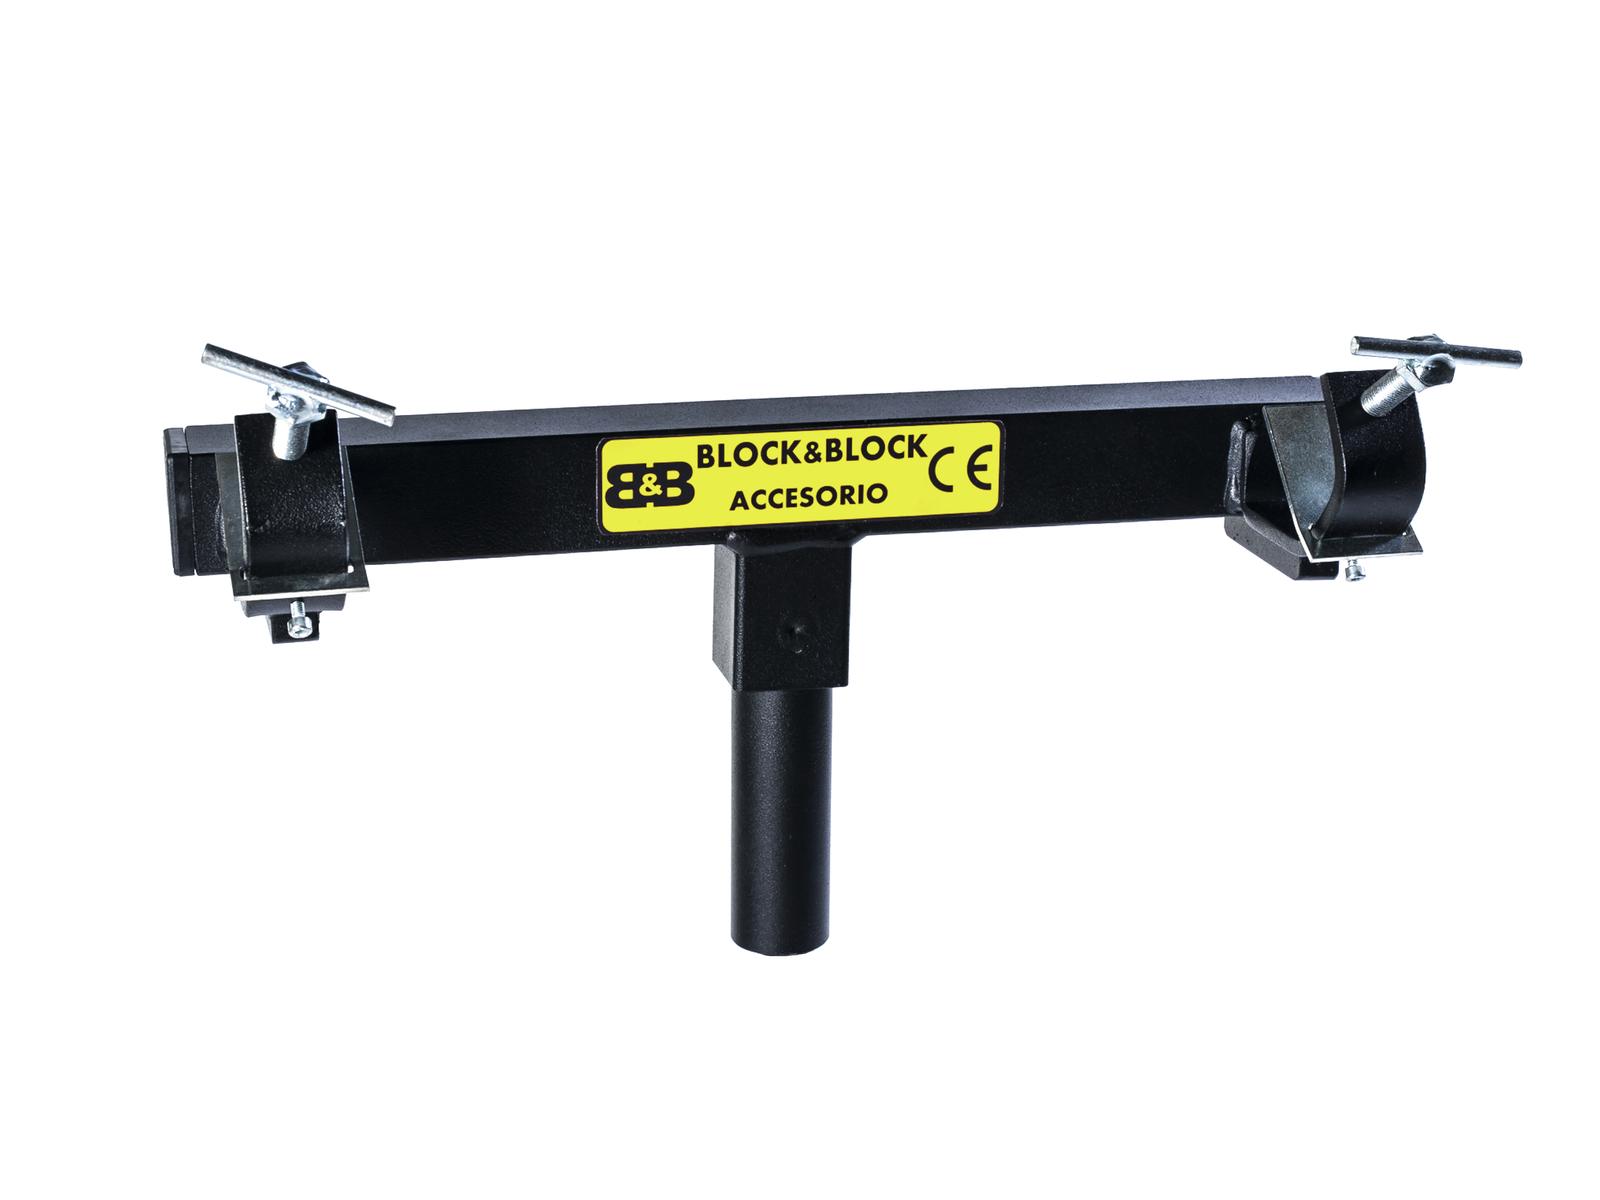 BLOCK AND BLOCK AM3503 Traversenadapter 35mm Aufnahme male